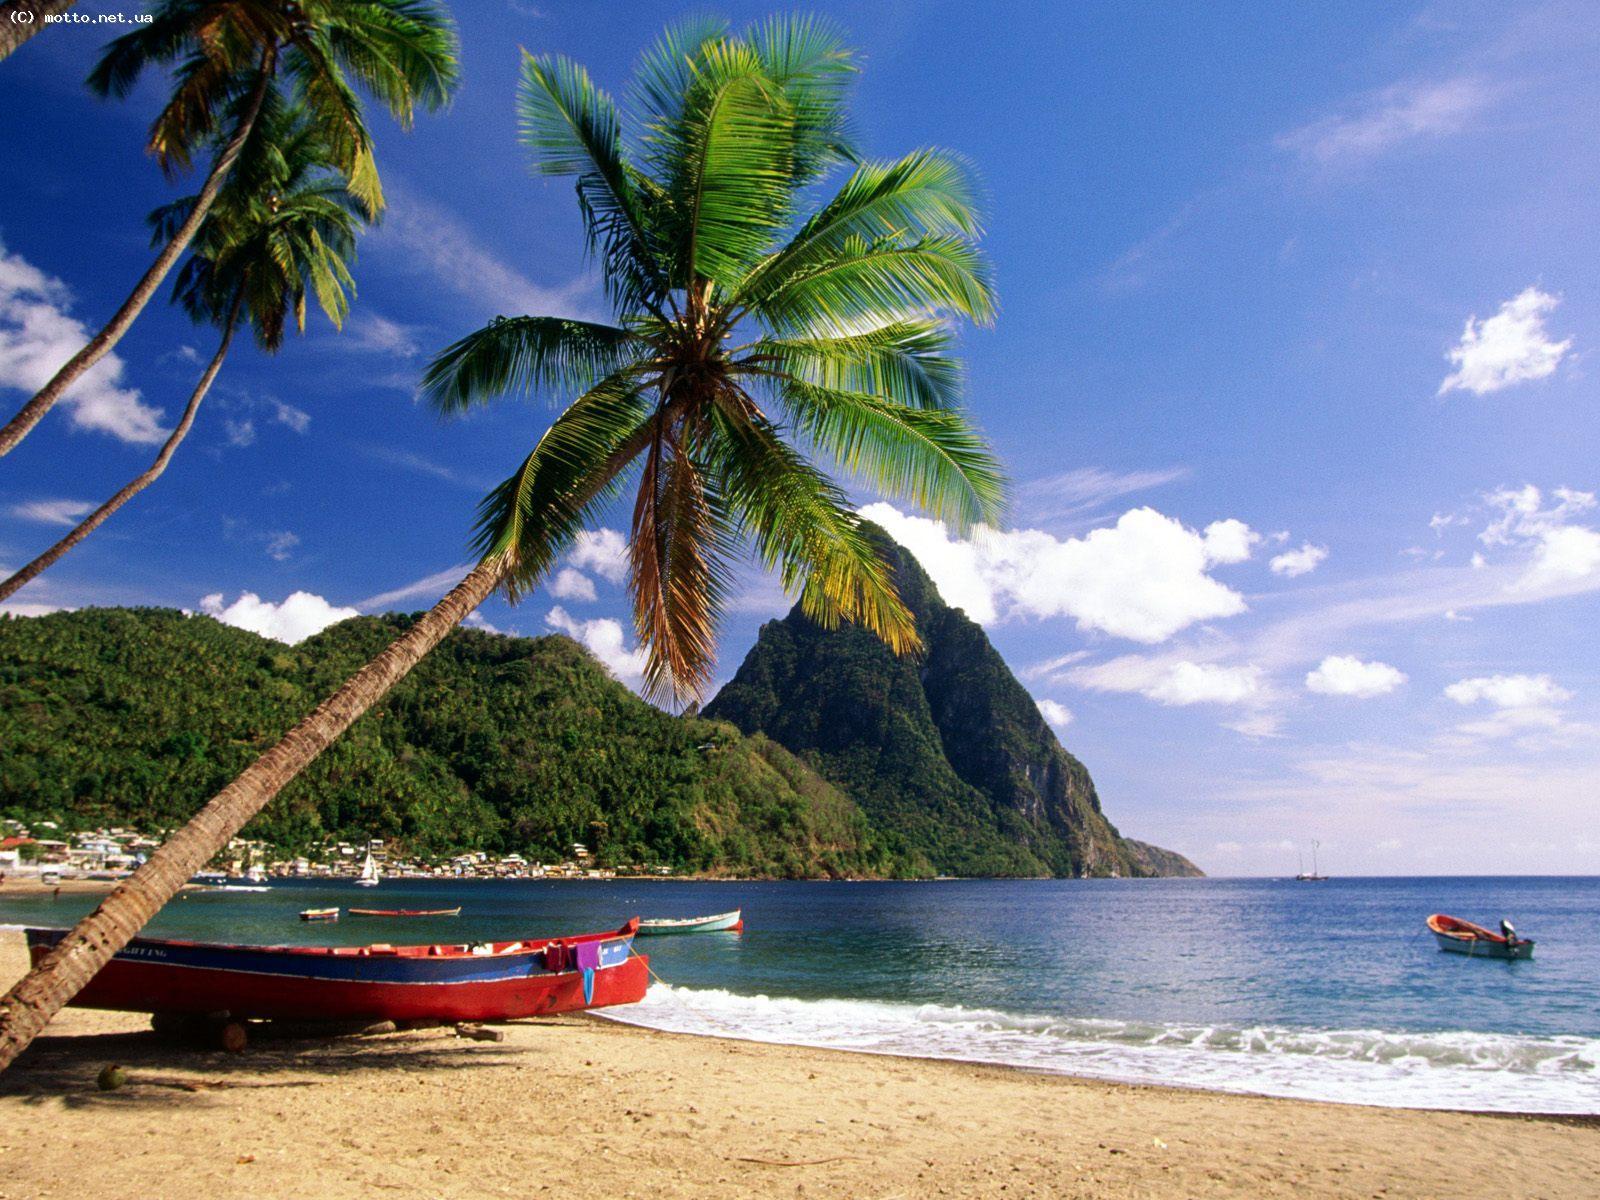 St_Lucia_West_Indies